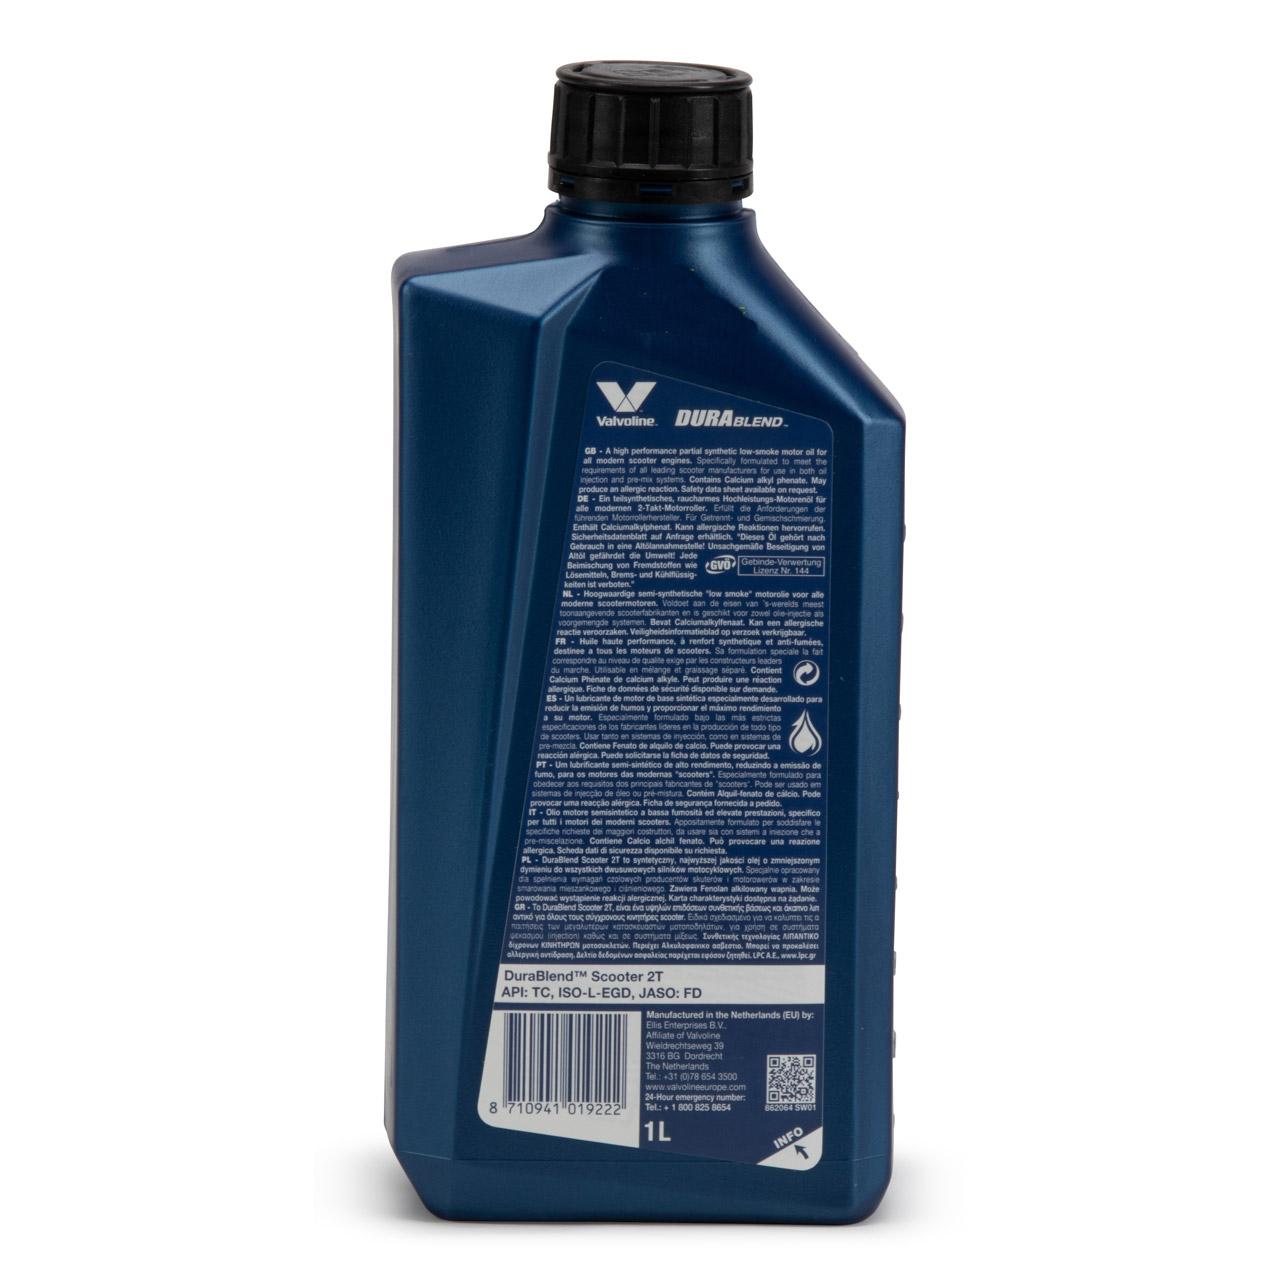 VALVOLINE Motoröl ÖL DURABLEND 2-TAKT API TC ISO-L-EGD JASO FD - 1L 1 Liter